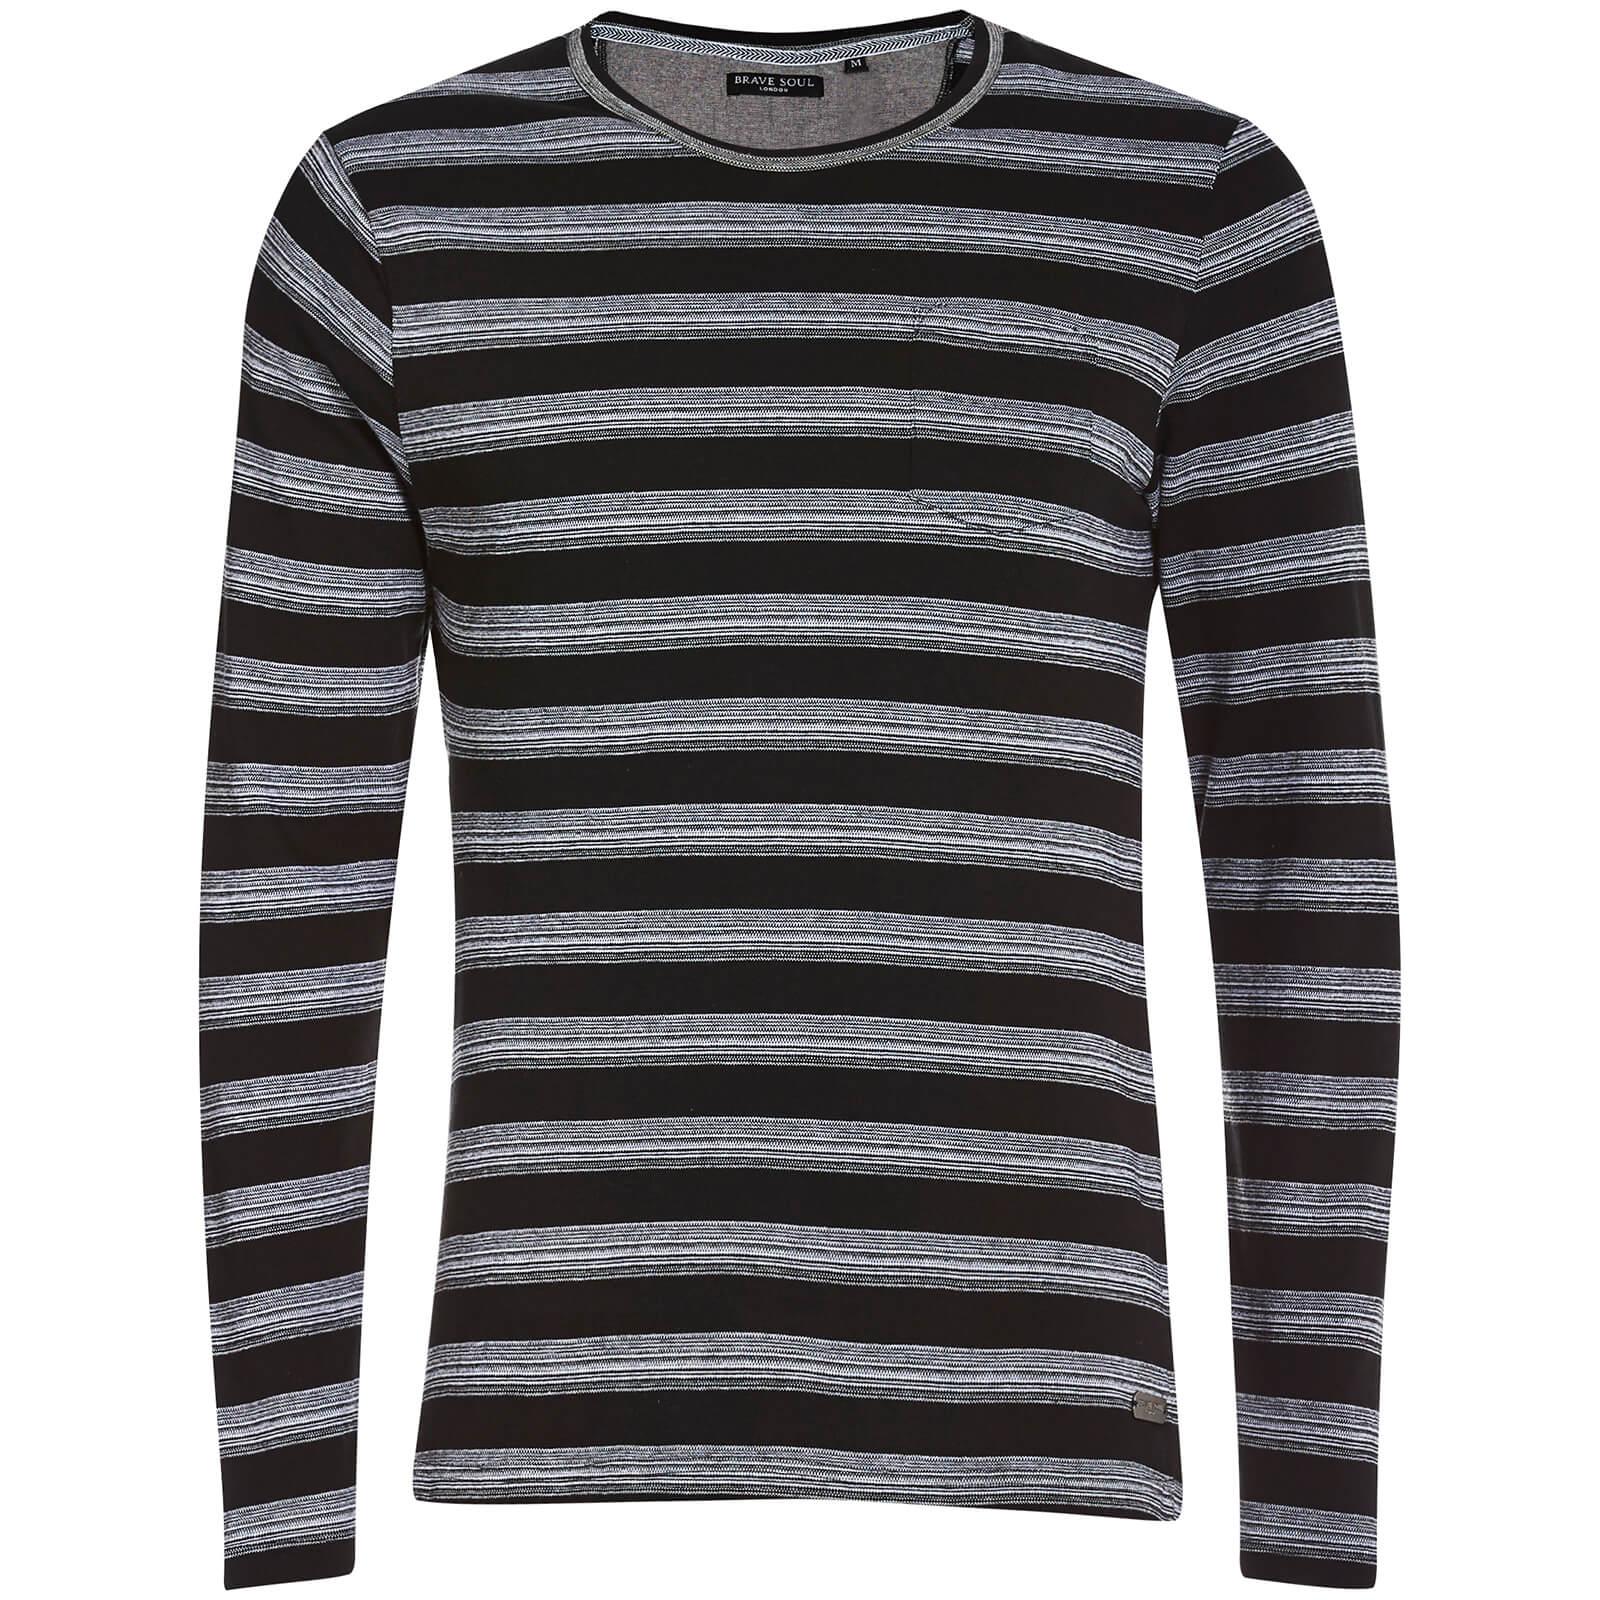 9a2cbaf84a13 Brave Soul Men's Slate Stripe Long Sleeve Top - Black Mens Clothing ...